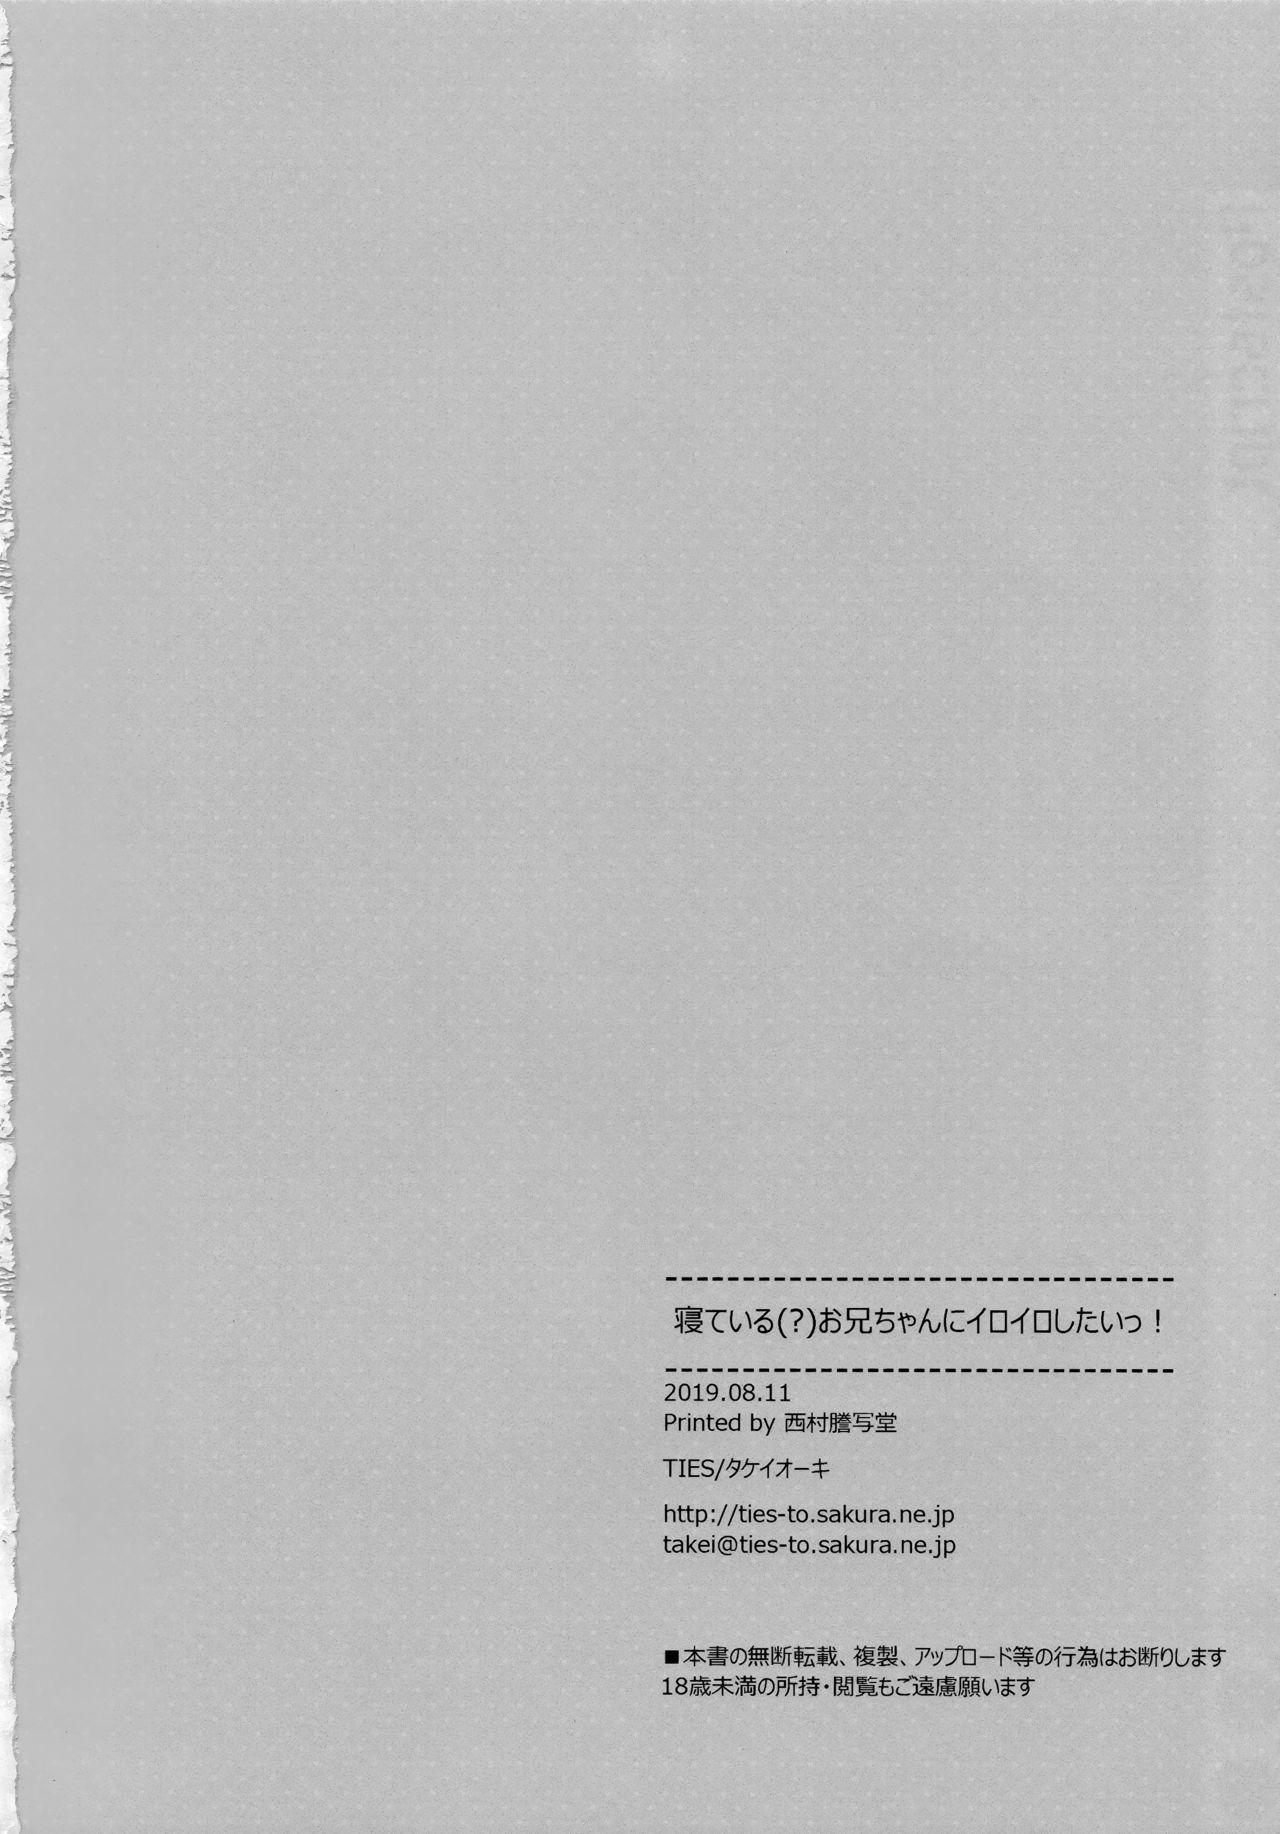 (C96) [TIES (Takei Ooki)] Neteiru (?) Onii-chan ni Iroiro Shitai! 24